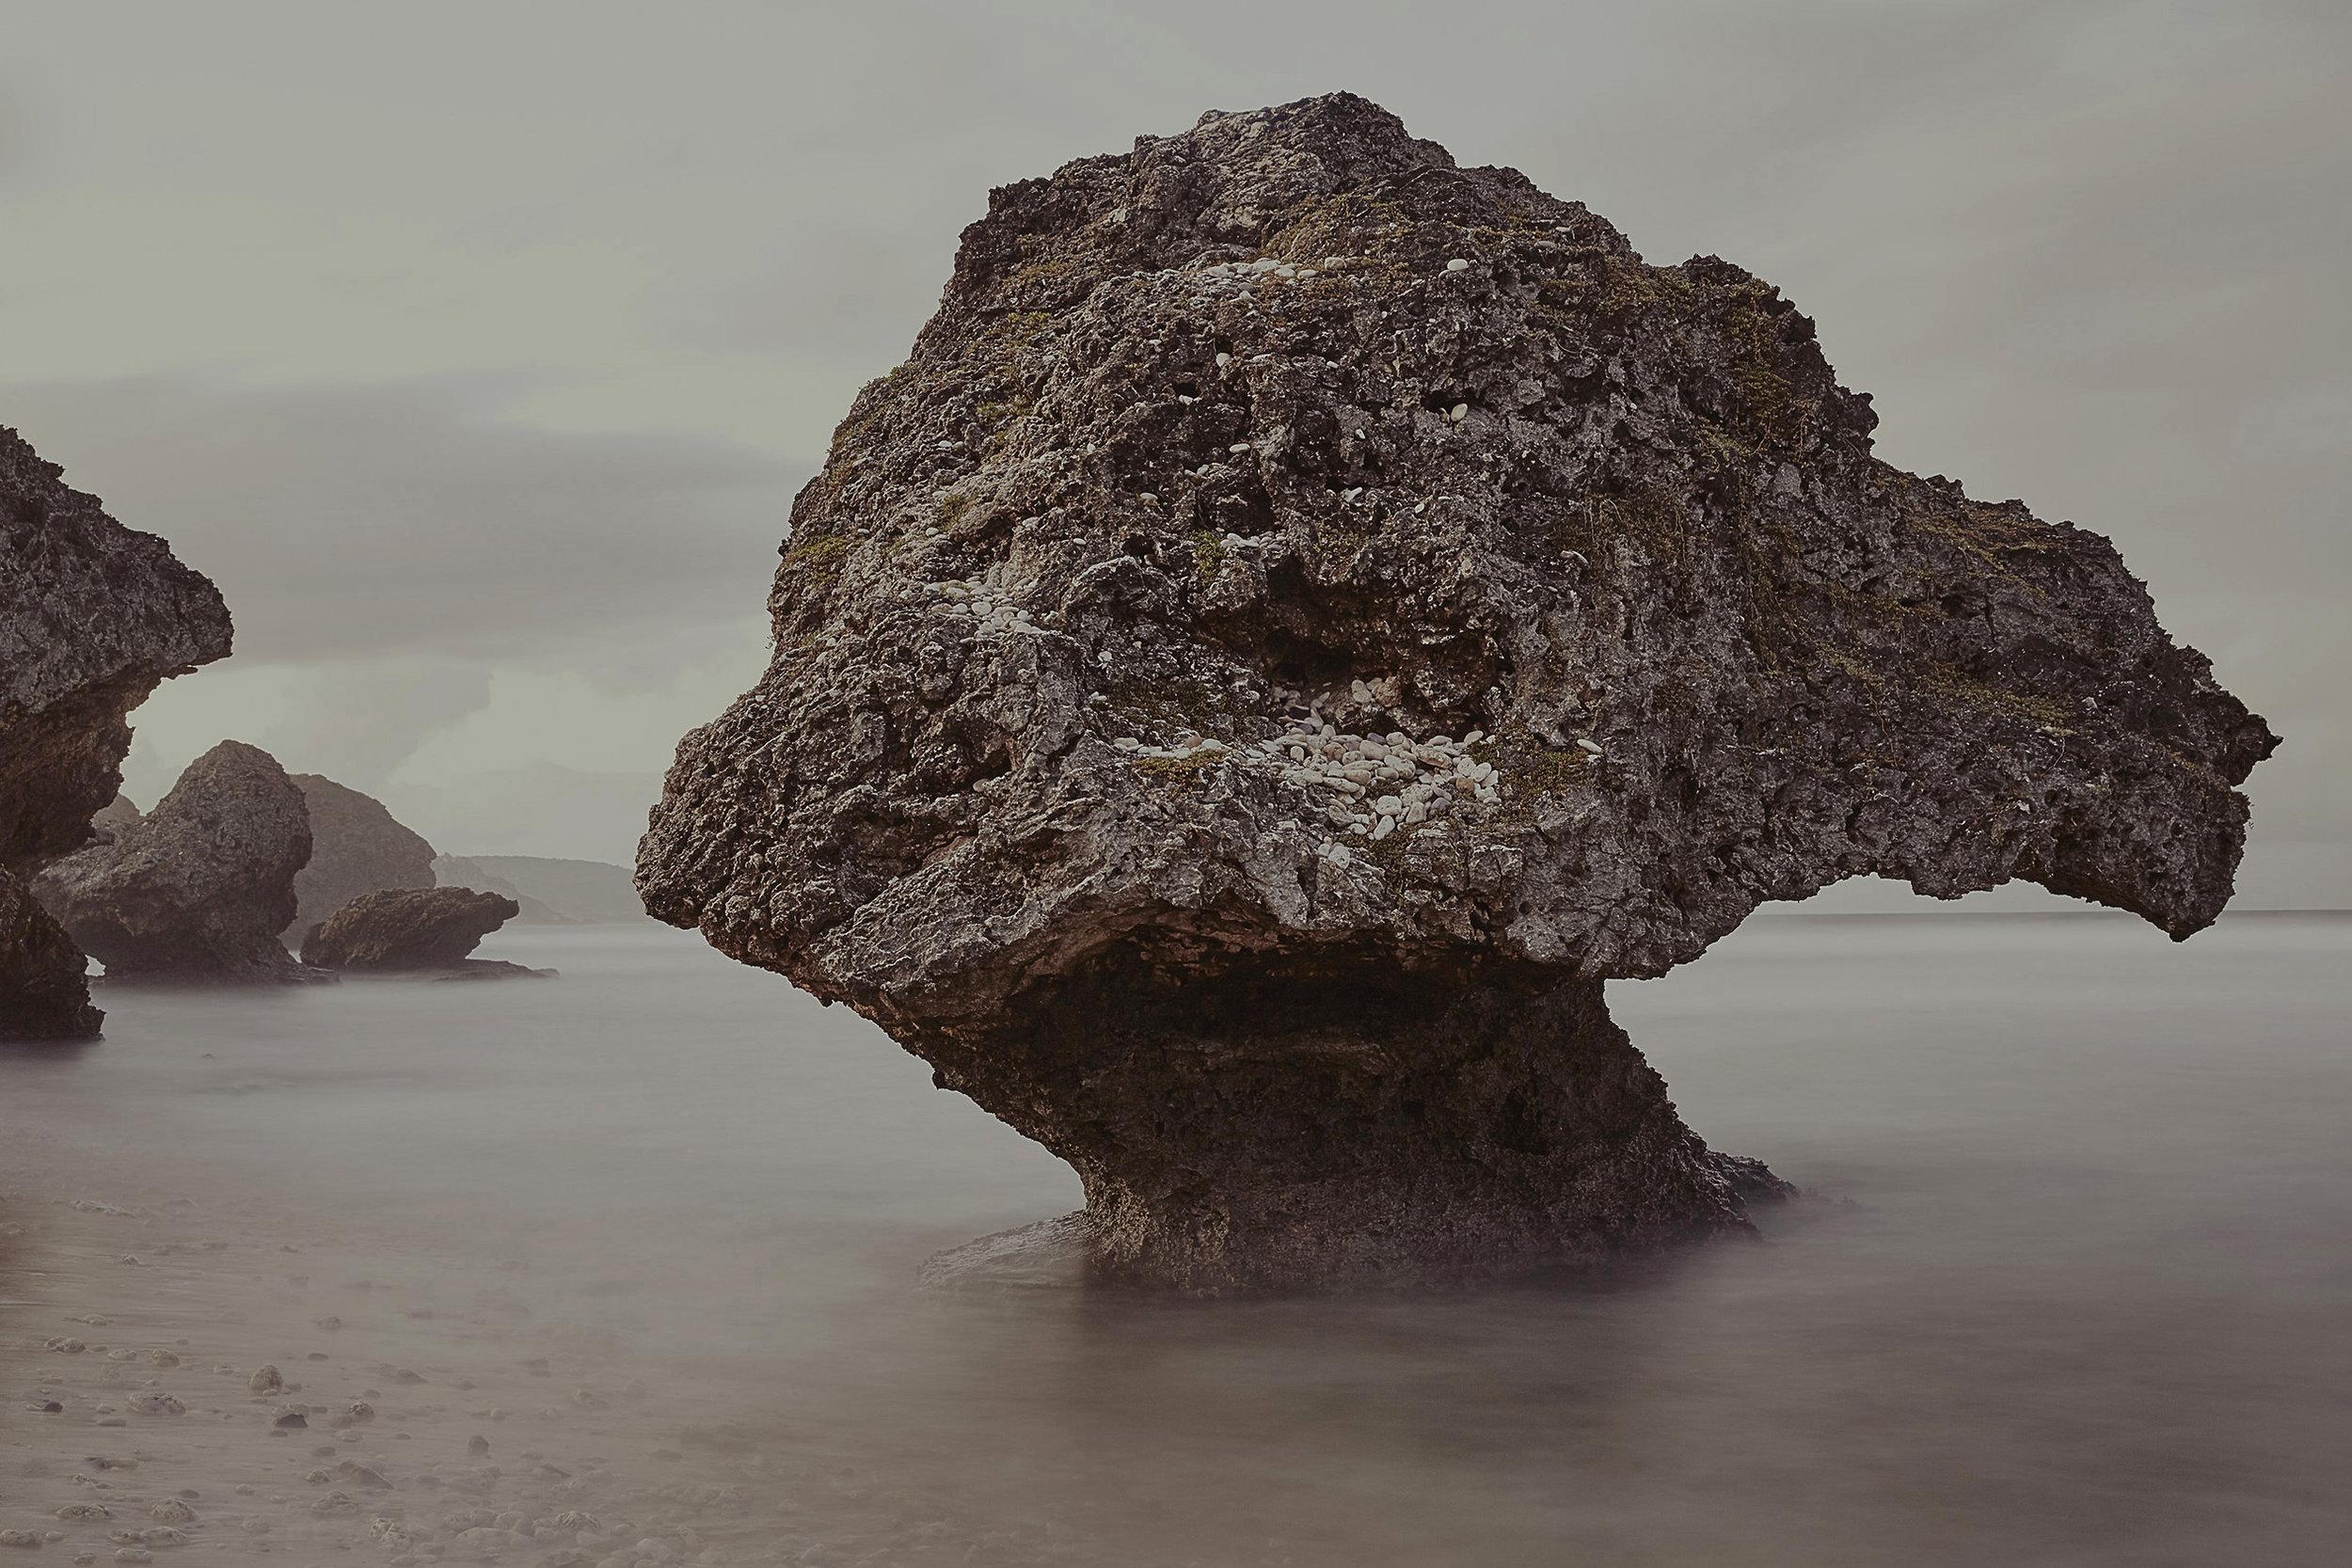 Patrick_Schuttler_Landscape_014.jpg